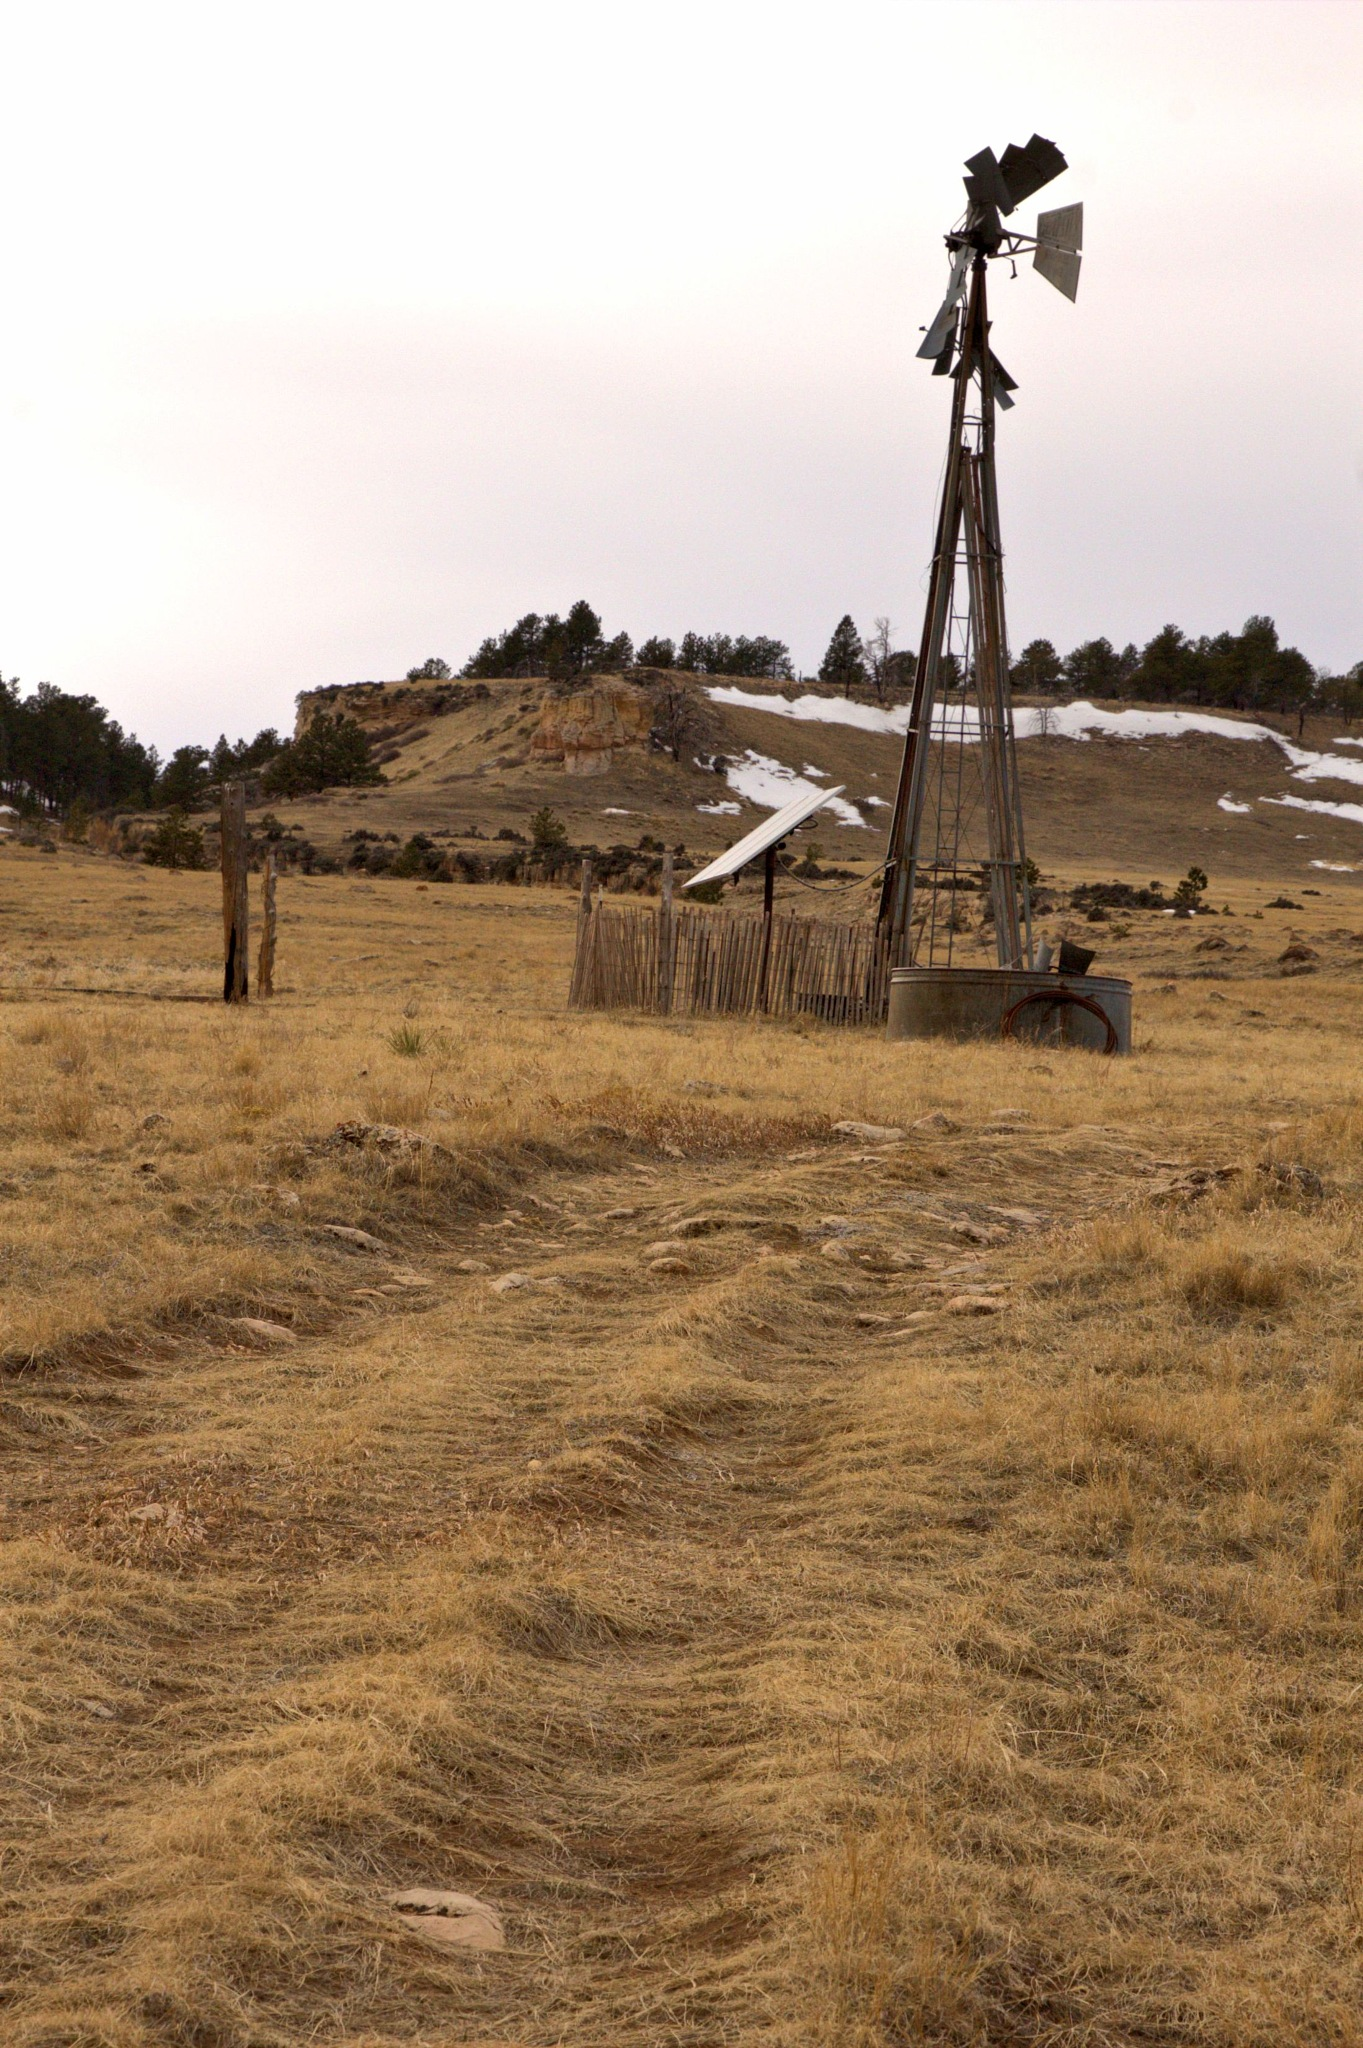 Old Abandoned Windmill by Carole Martinez